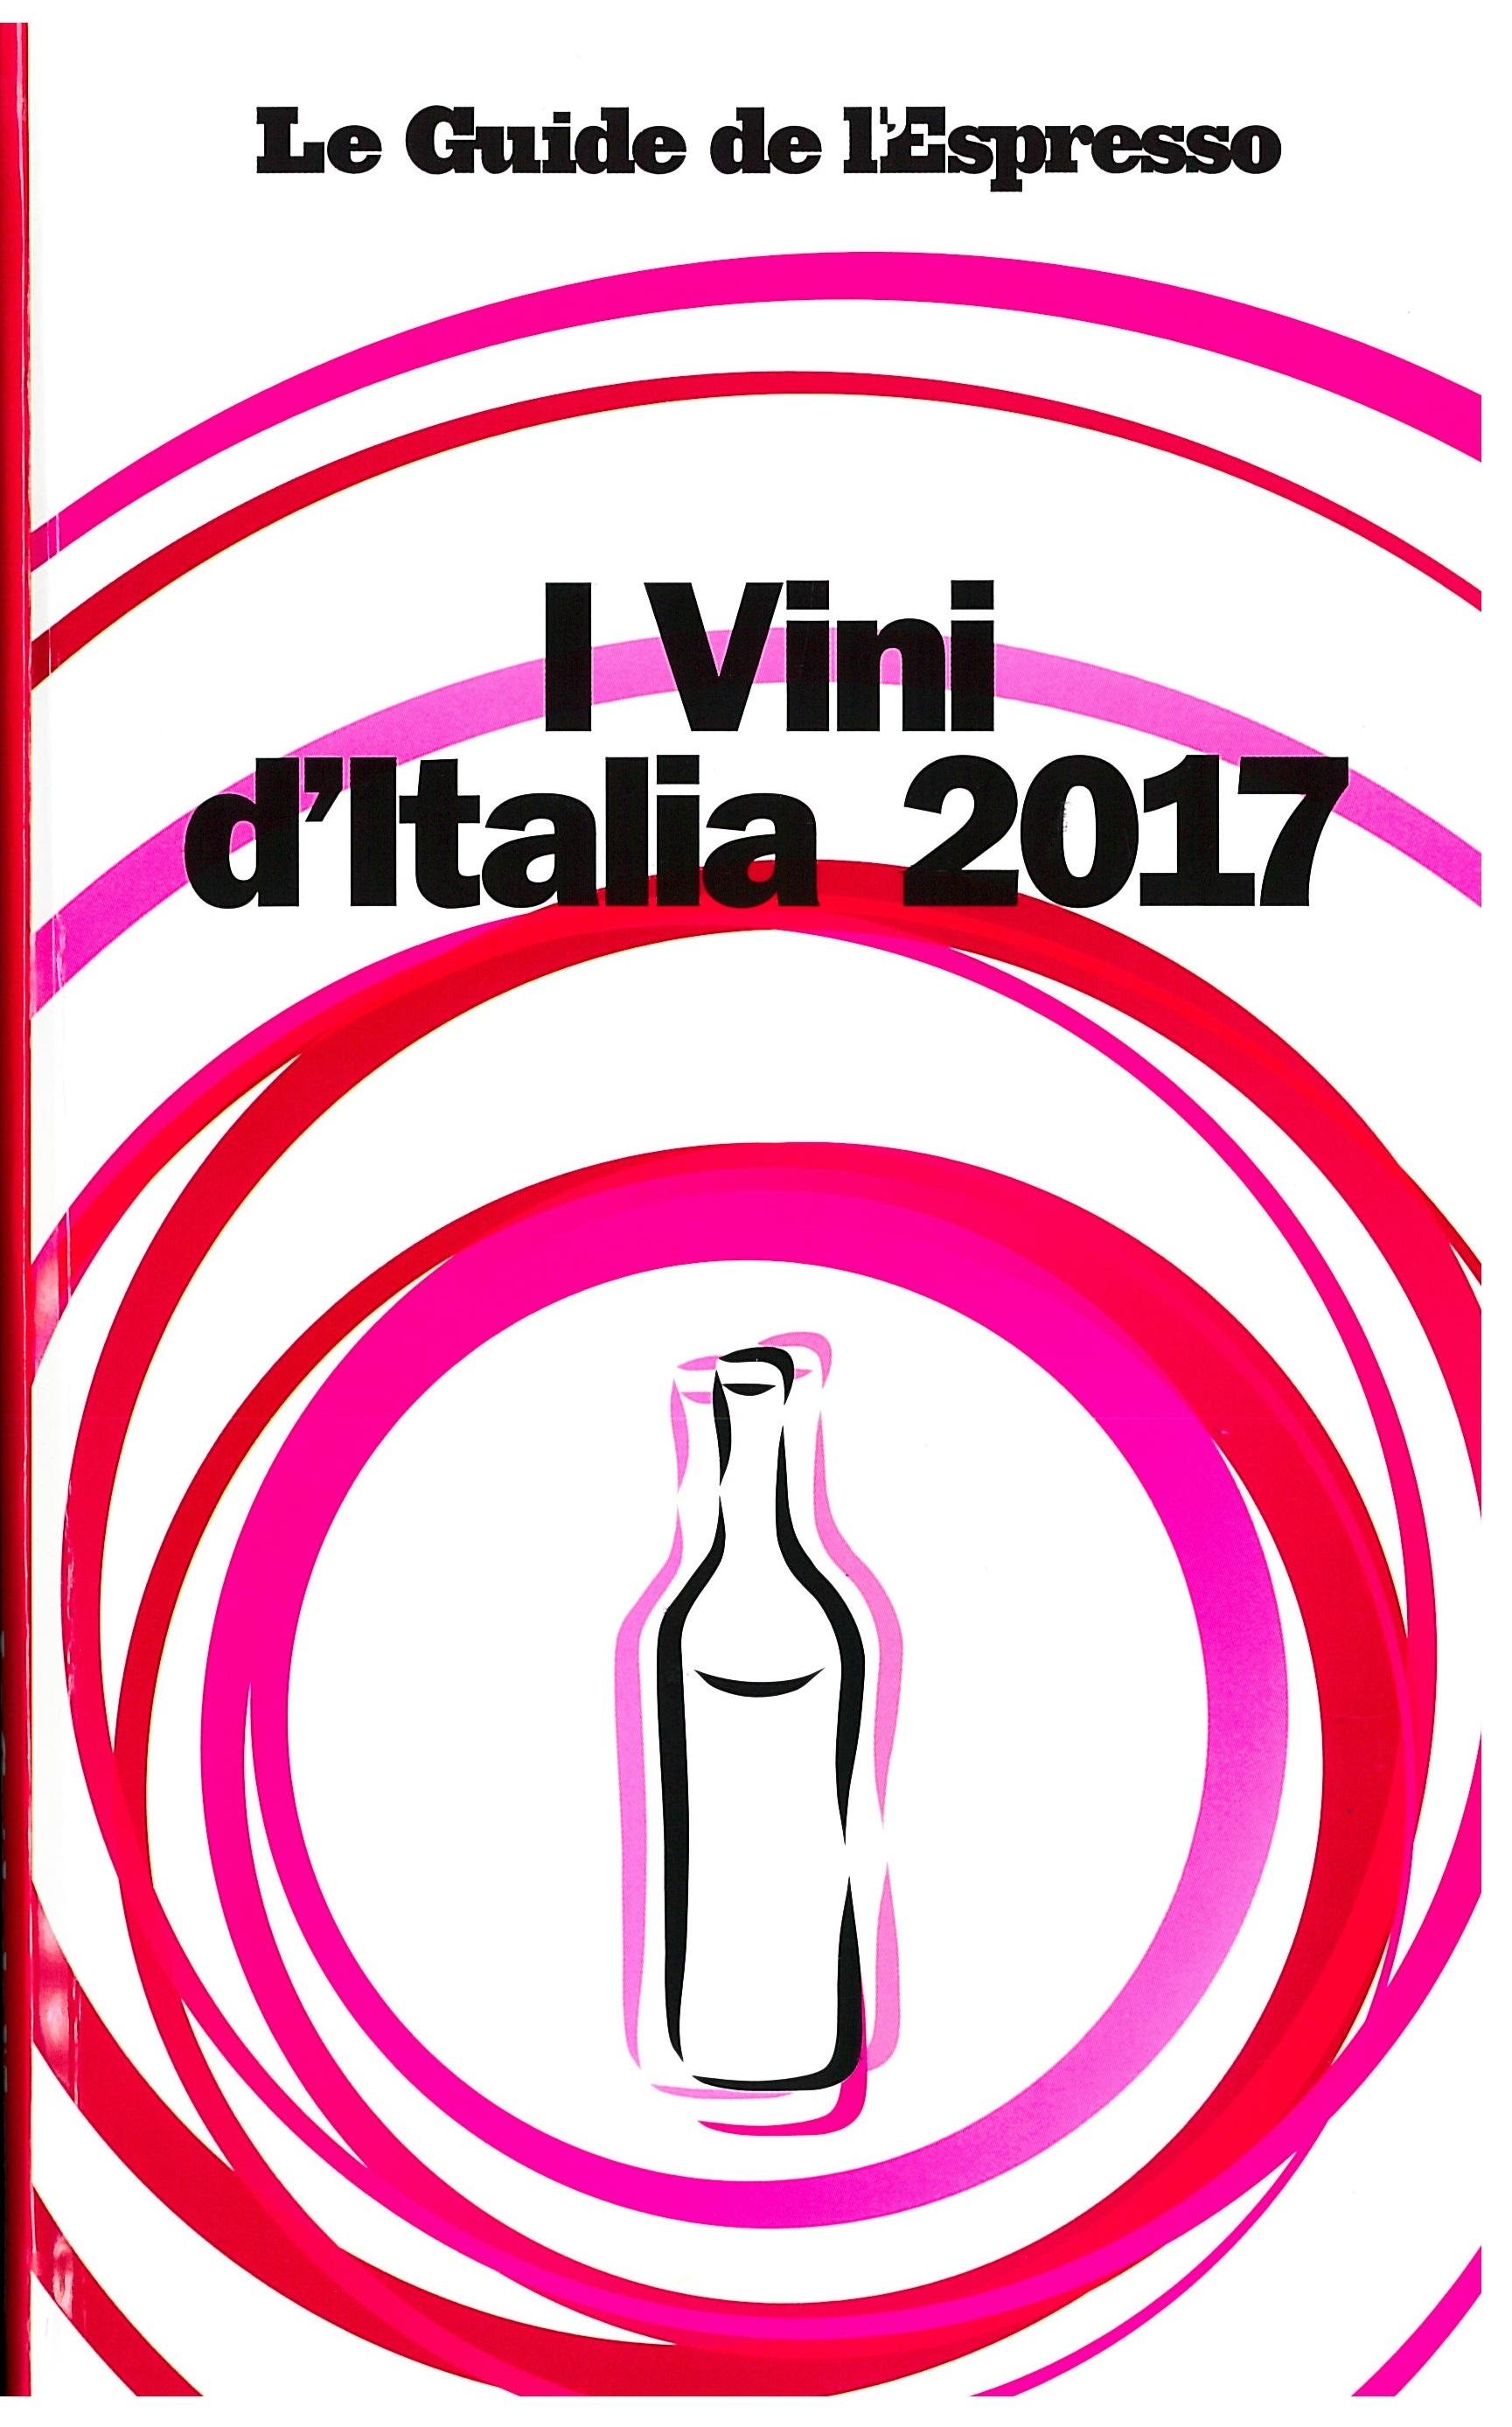 Espresso - I Vini d'Italia 2017_Cover.jpg